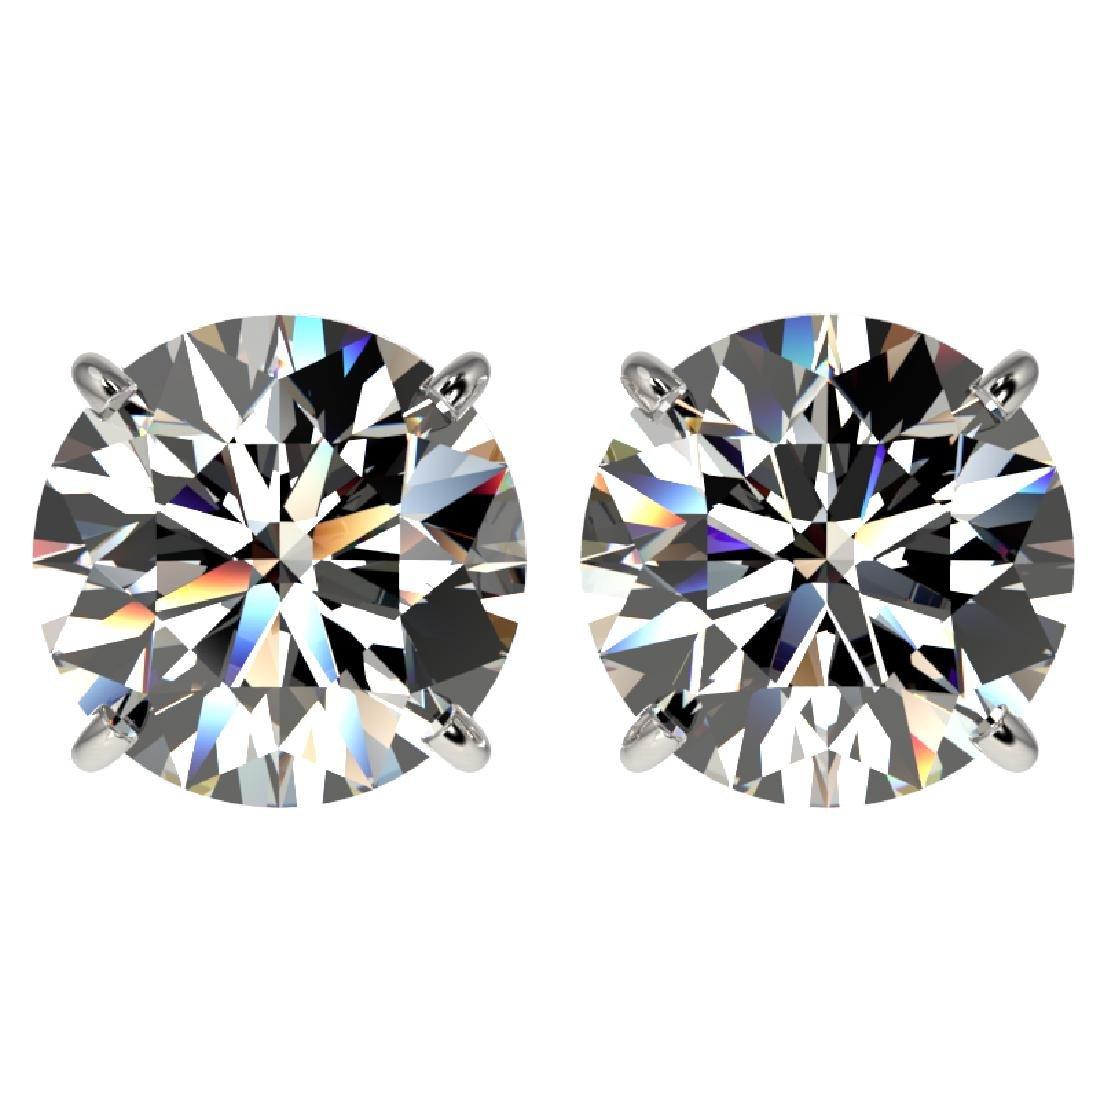 4.04 CTW Certified H-I Quality Diamond Stud Earrings